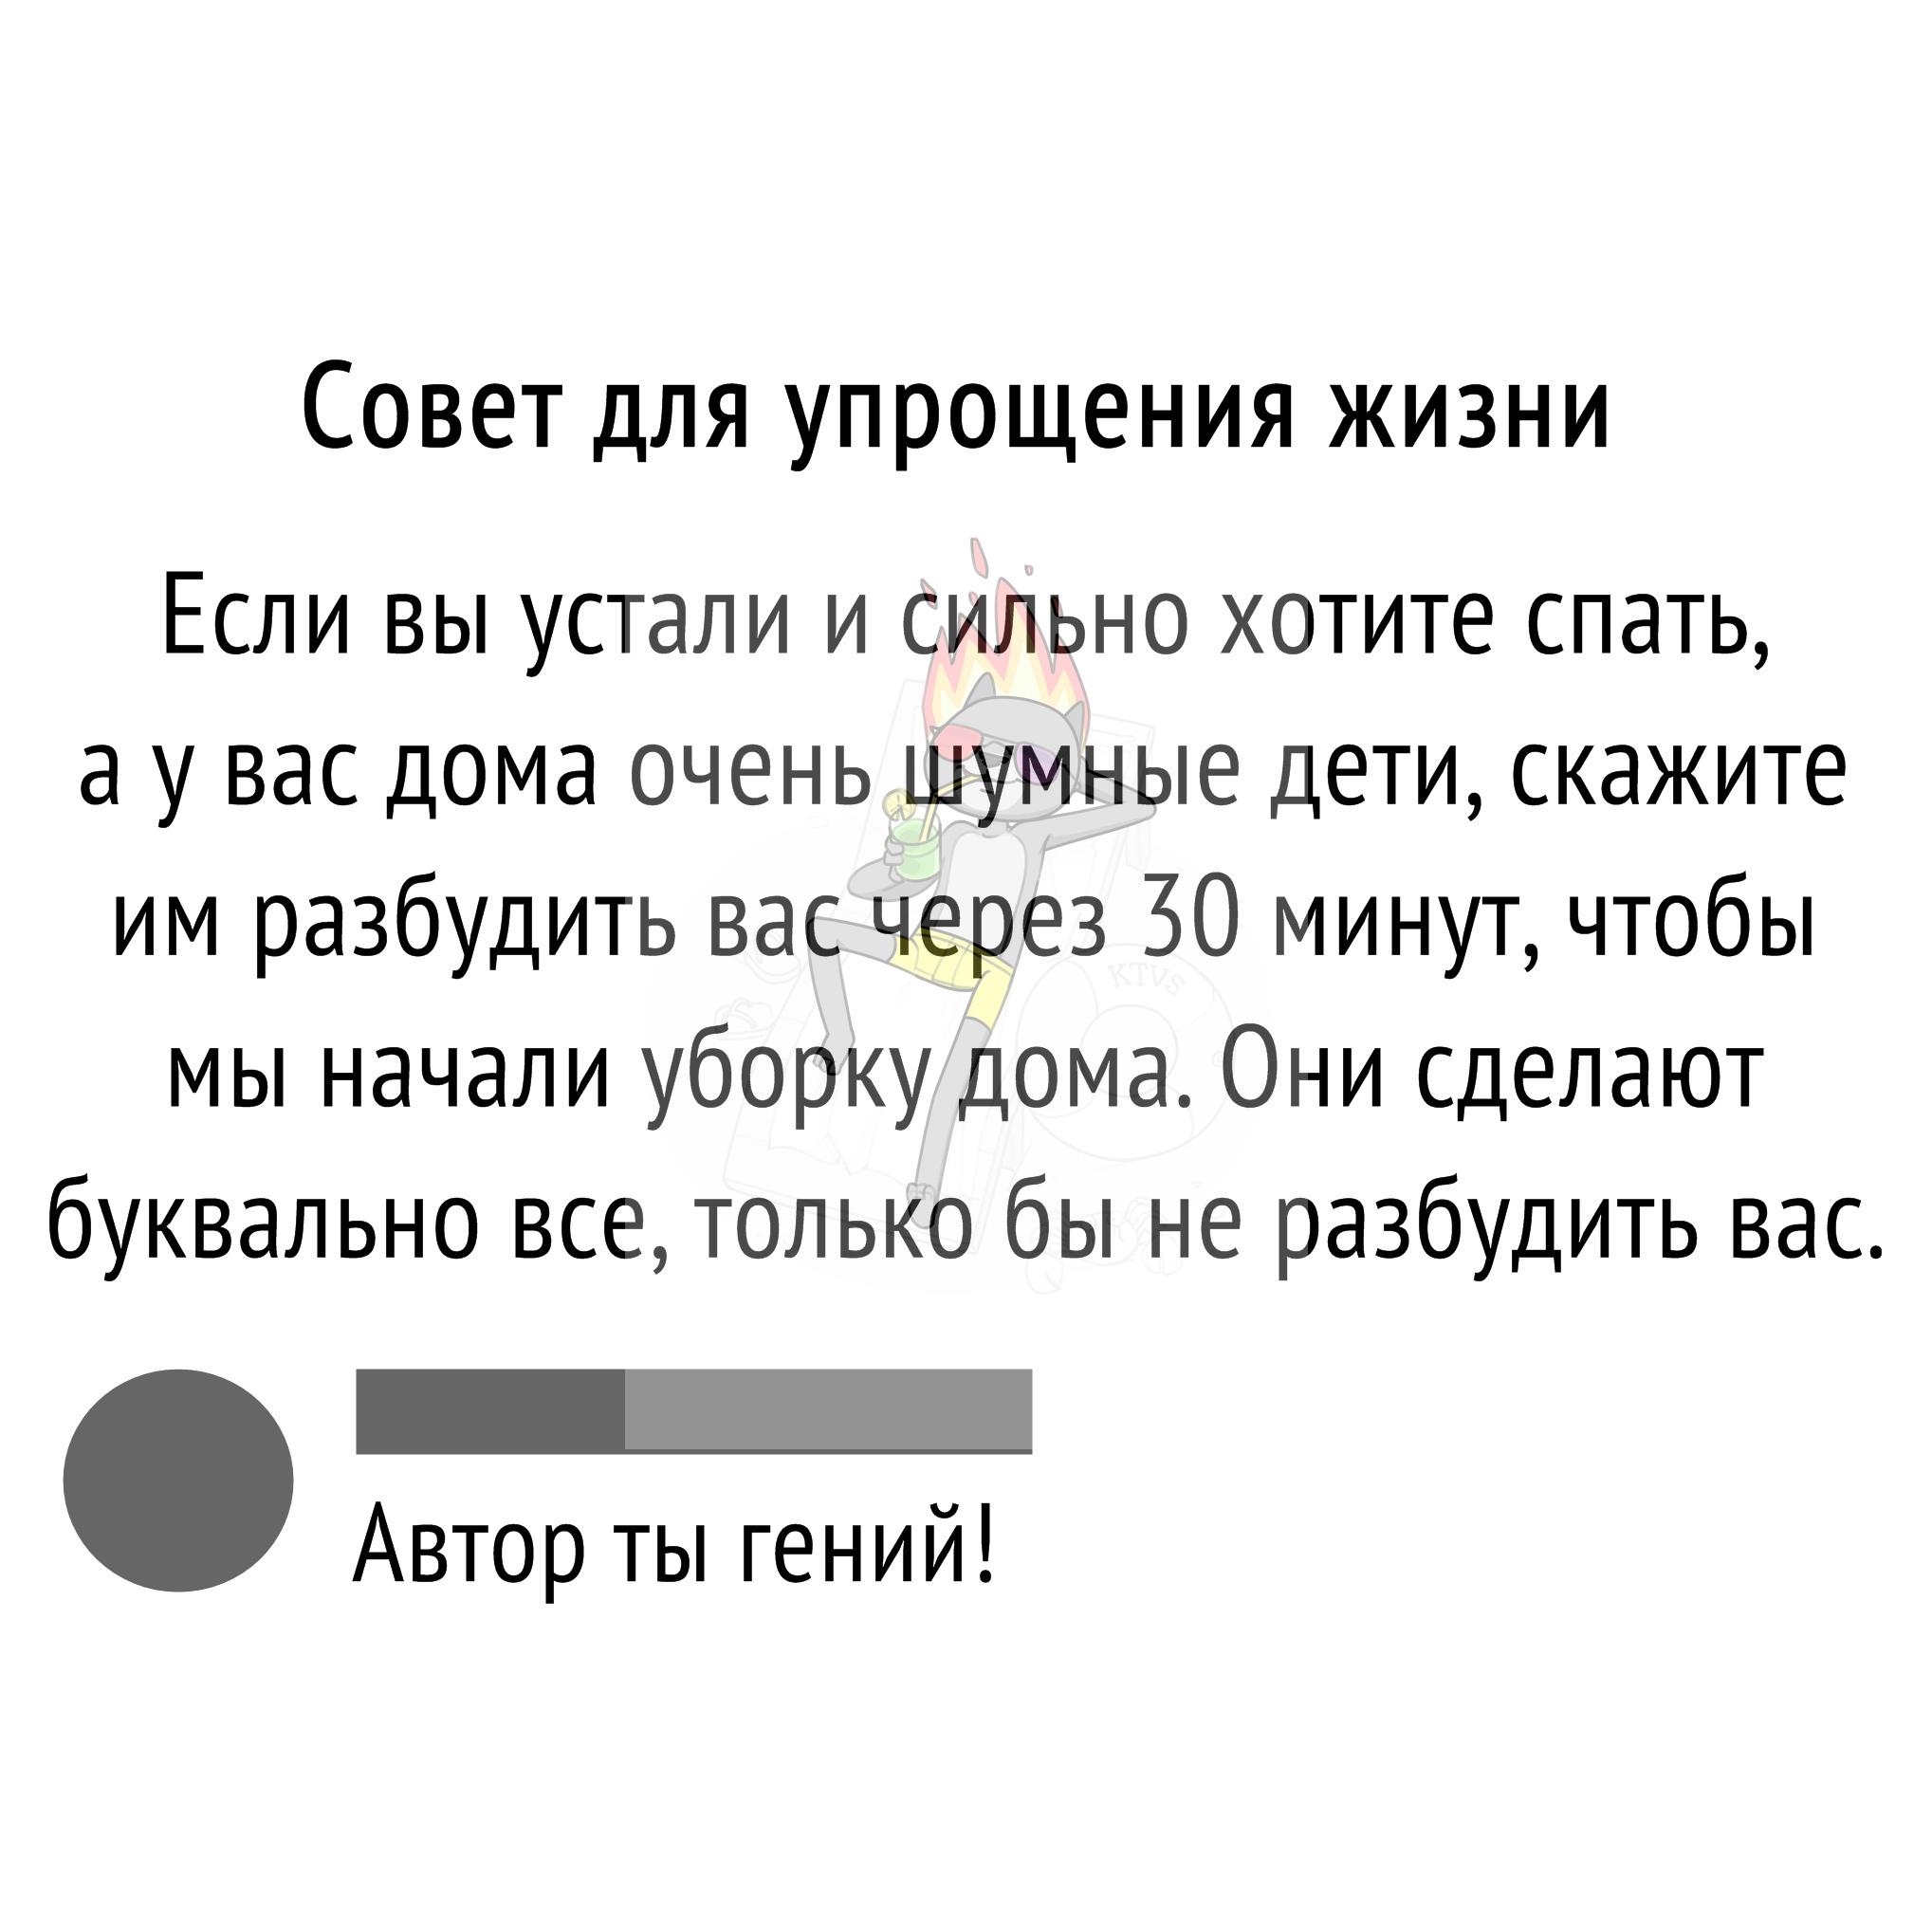 https://sun9-27.userapi.com/c540100/v540100442/4dbf6/Takt49SUR-c.jpg